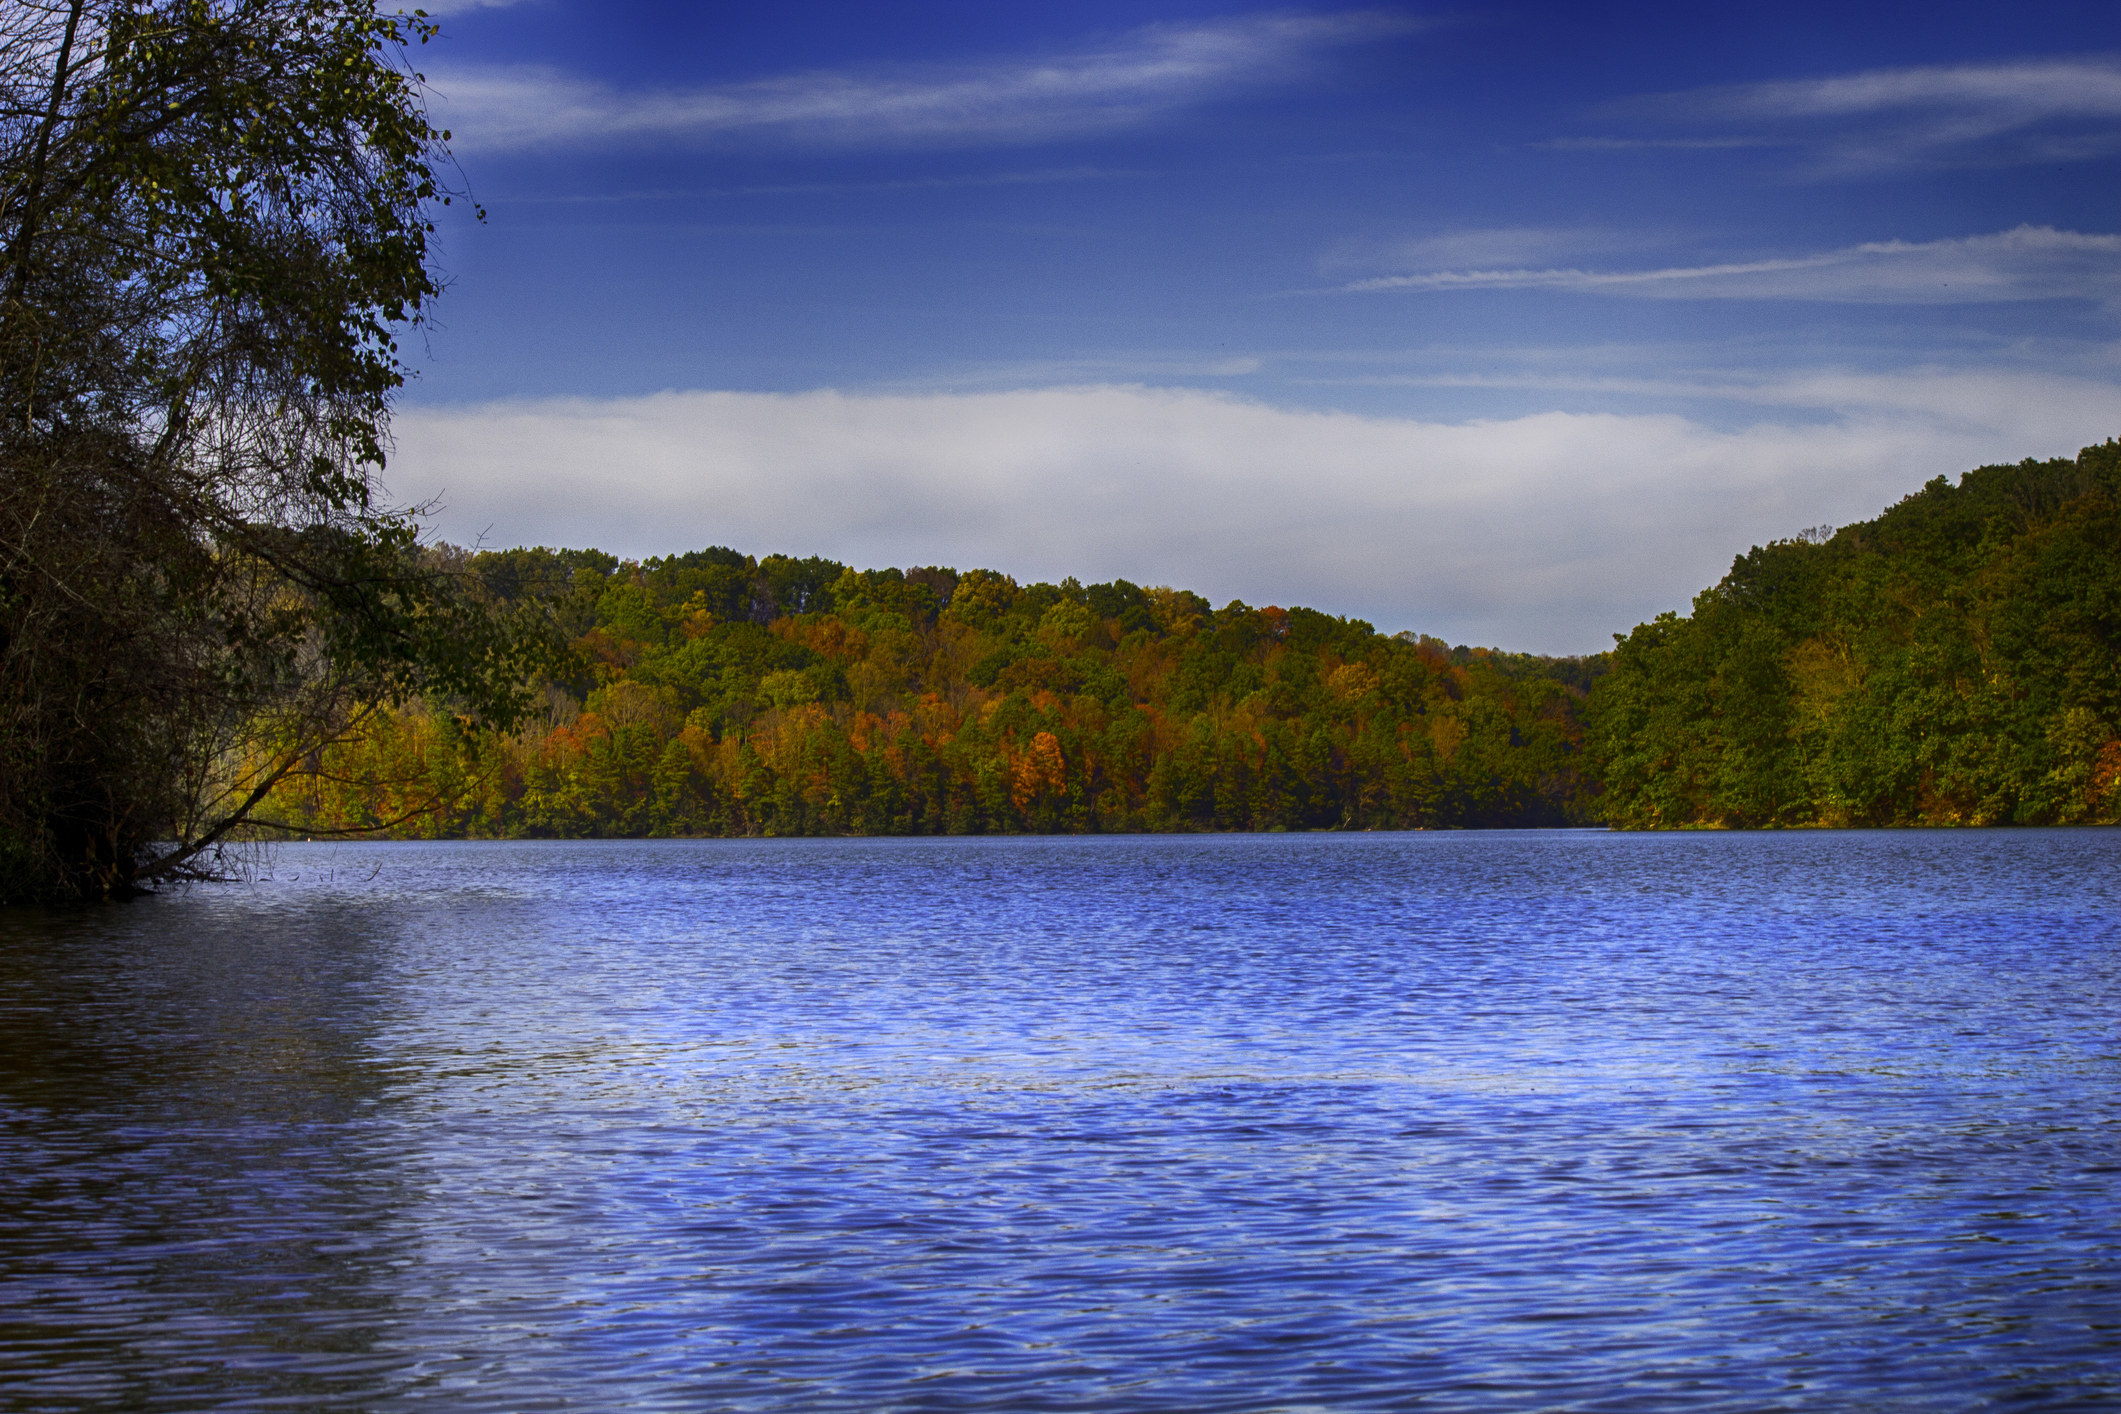 A beautiful lake scene